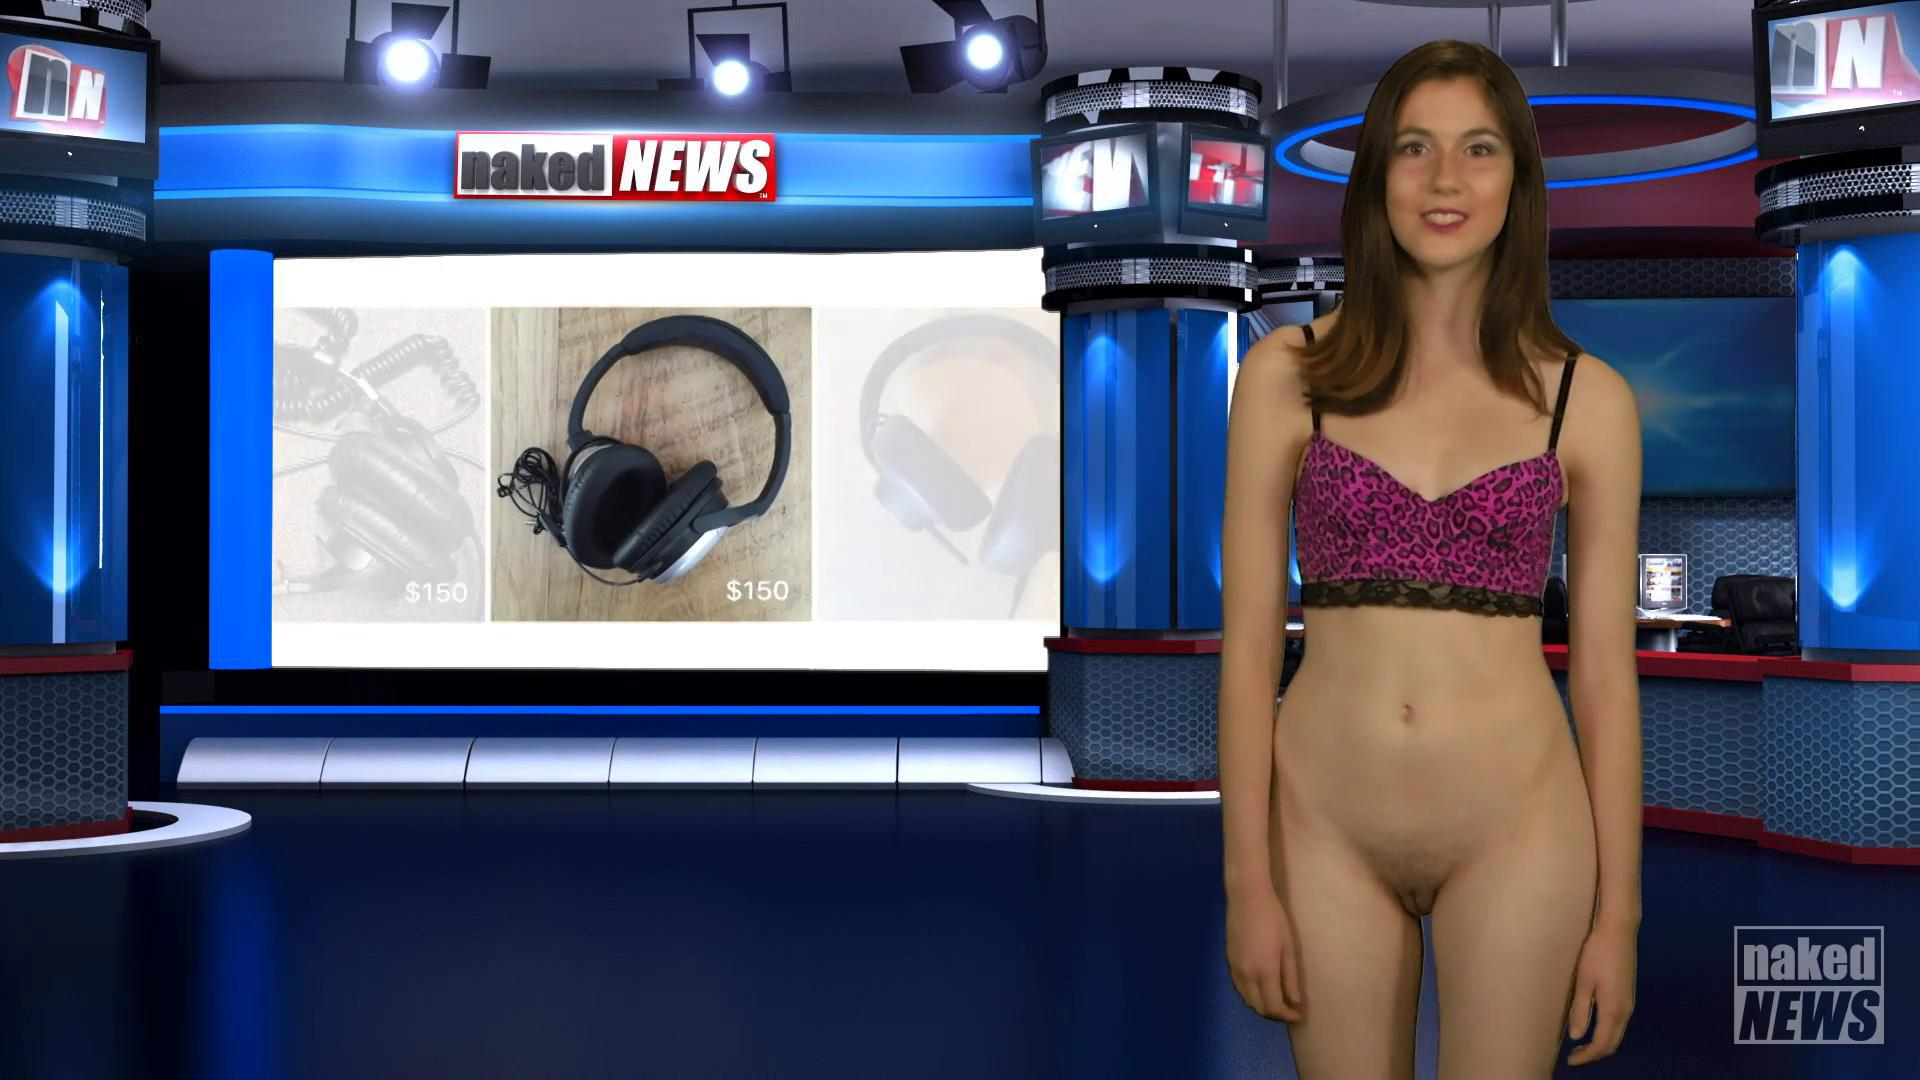 Video roxanne west naked news vid